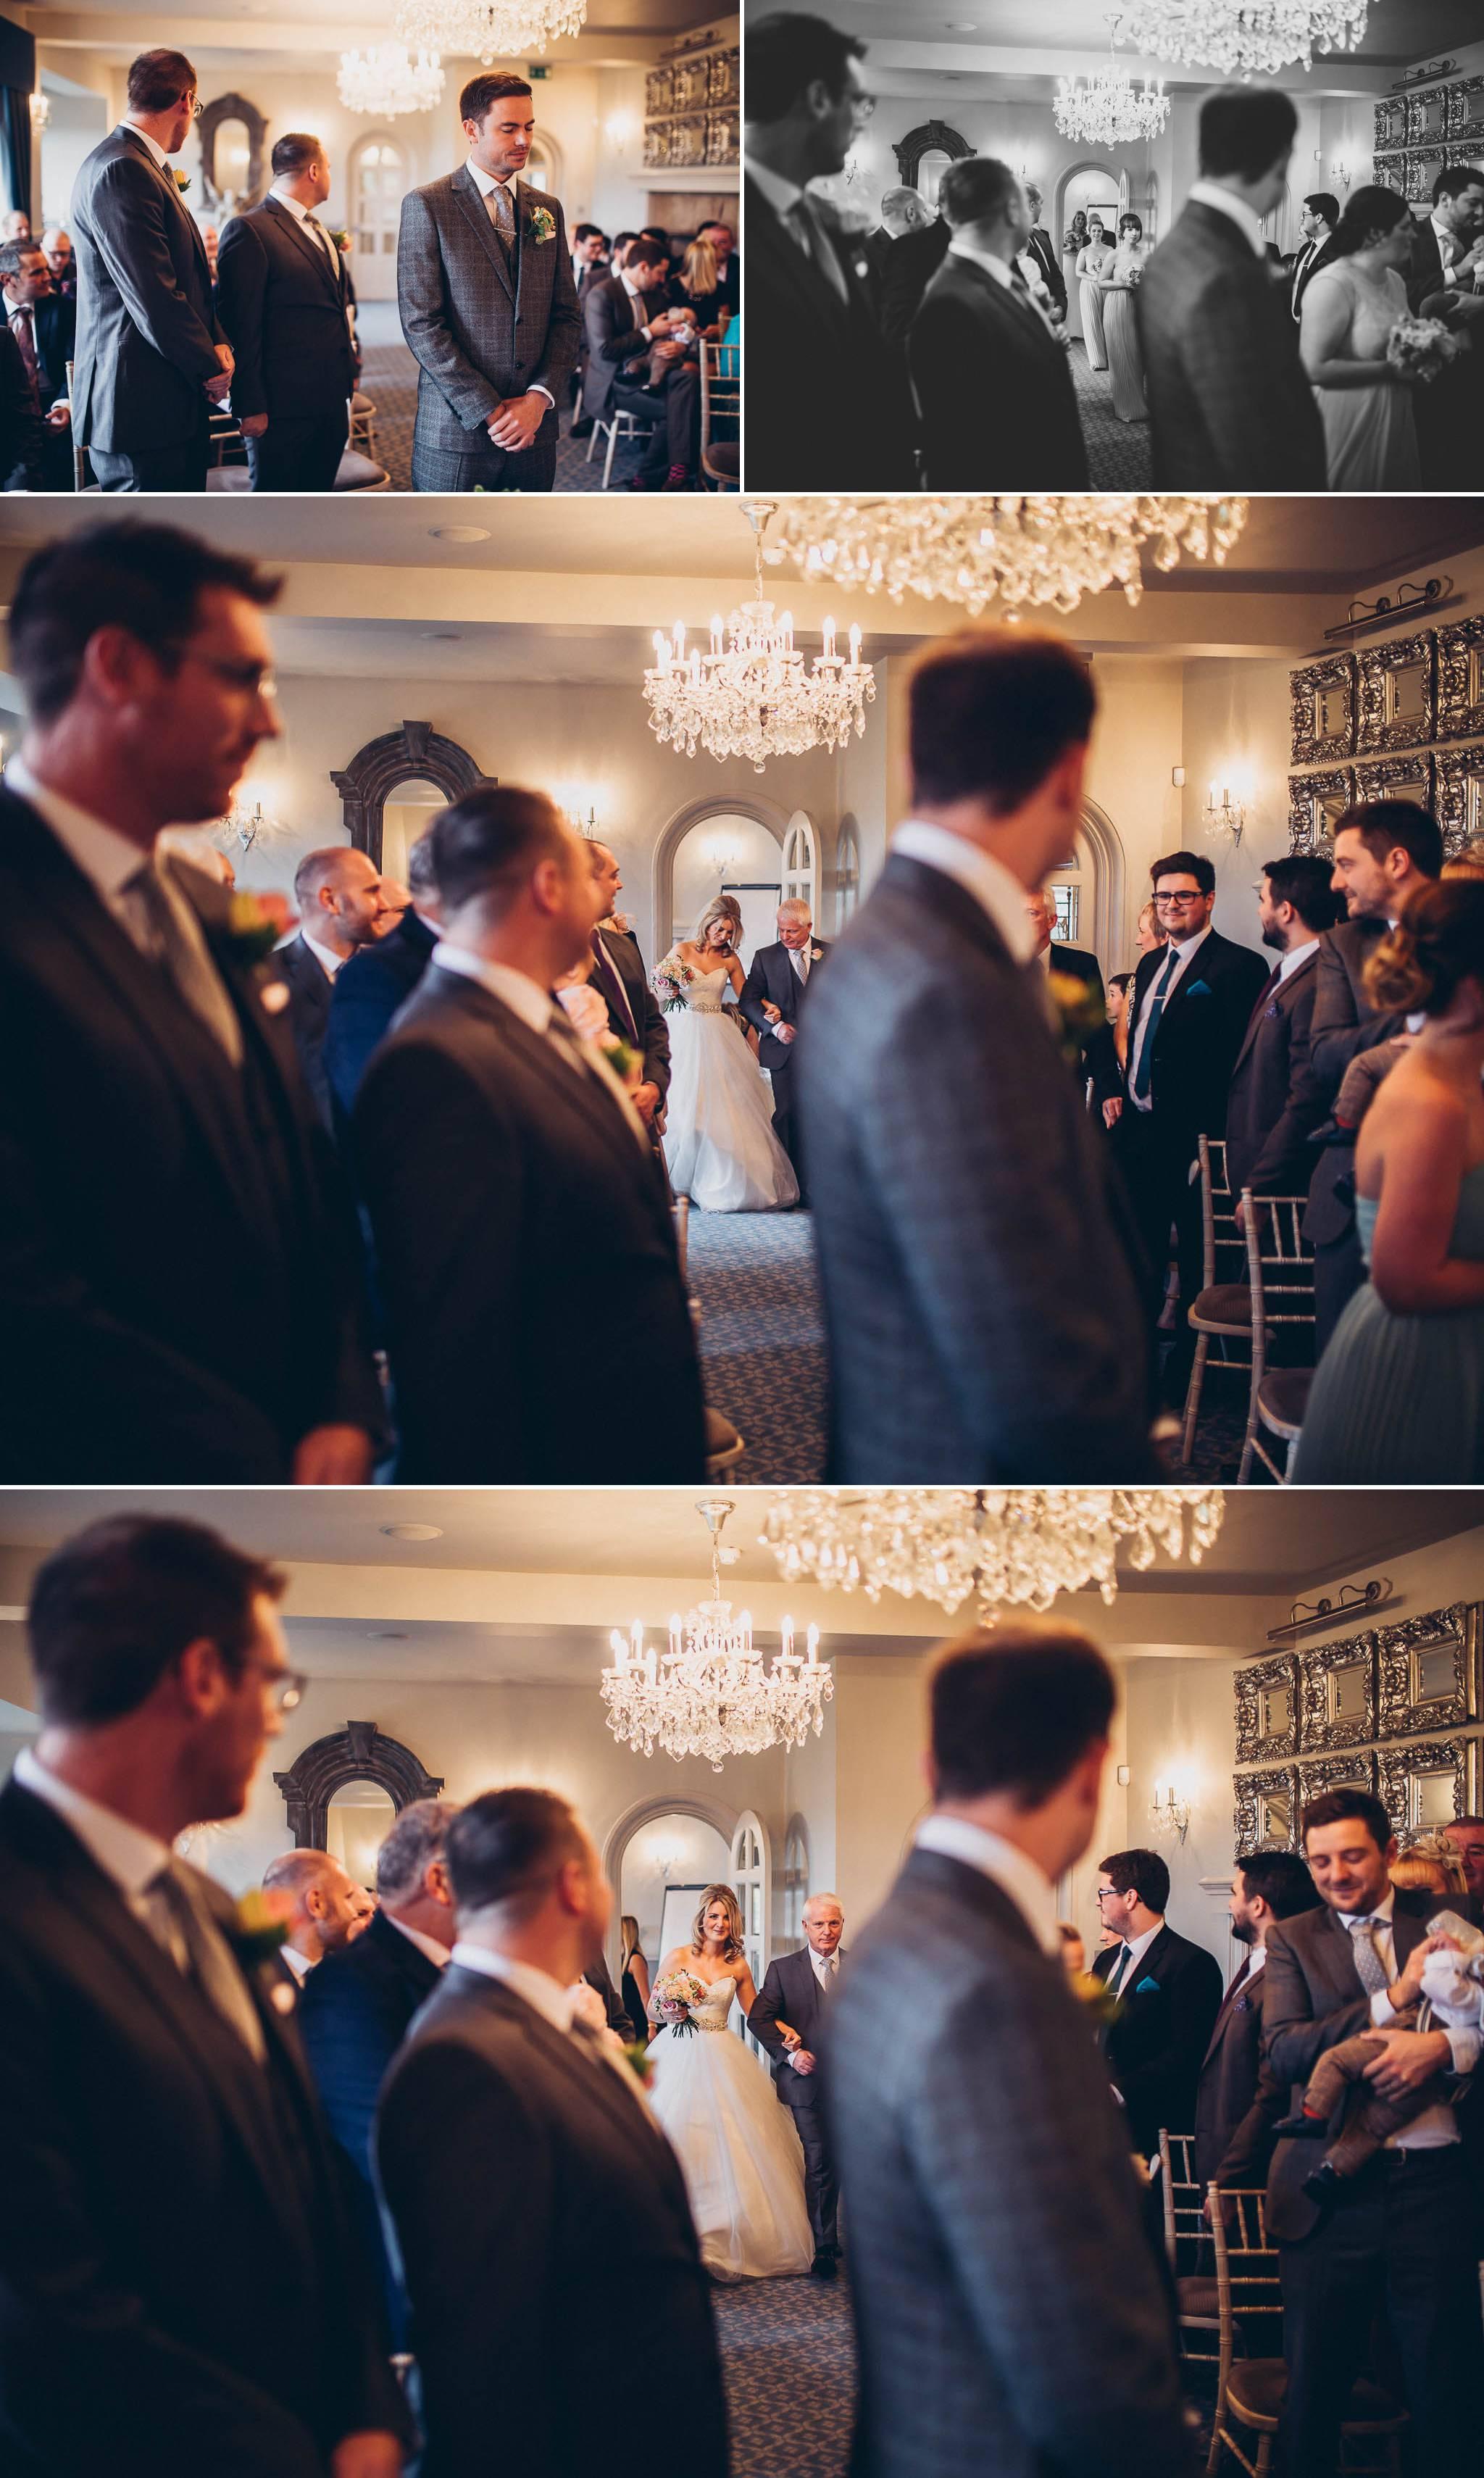 weston-hall-wedding-photographer 6.jpg